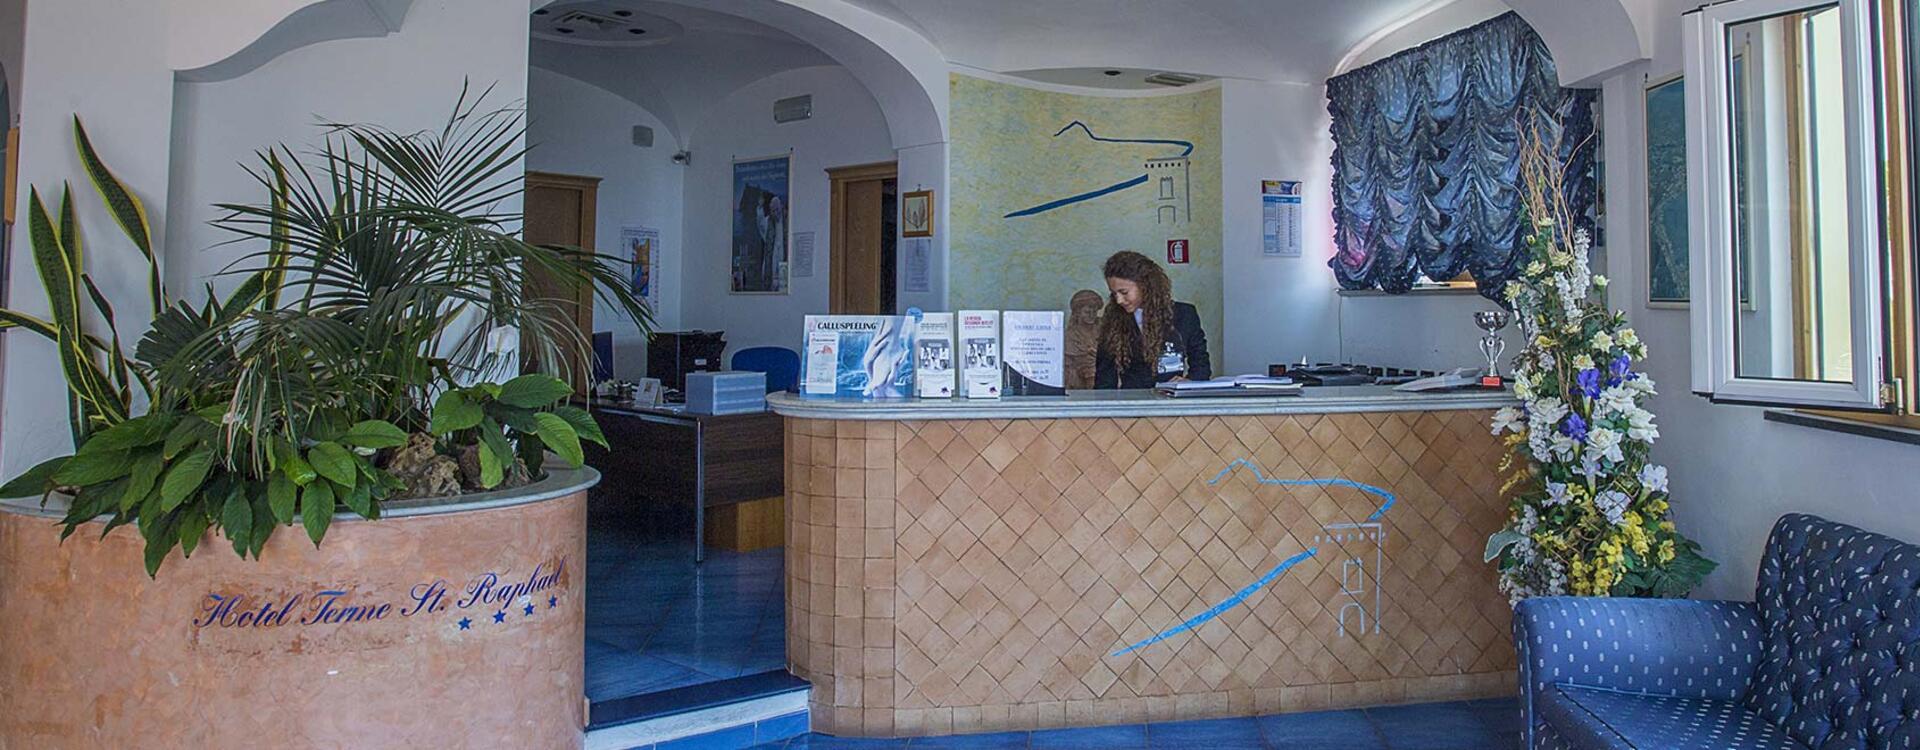 hotelsaintraphaelischia it contatti 010